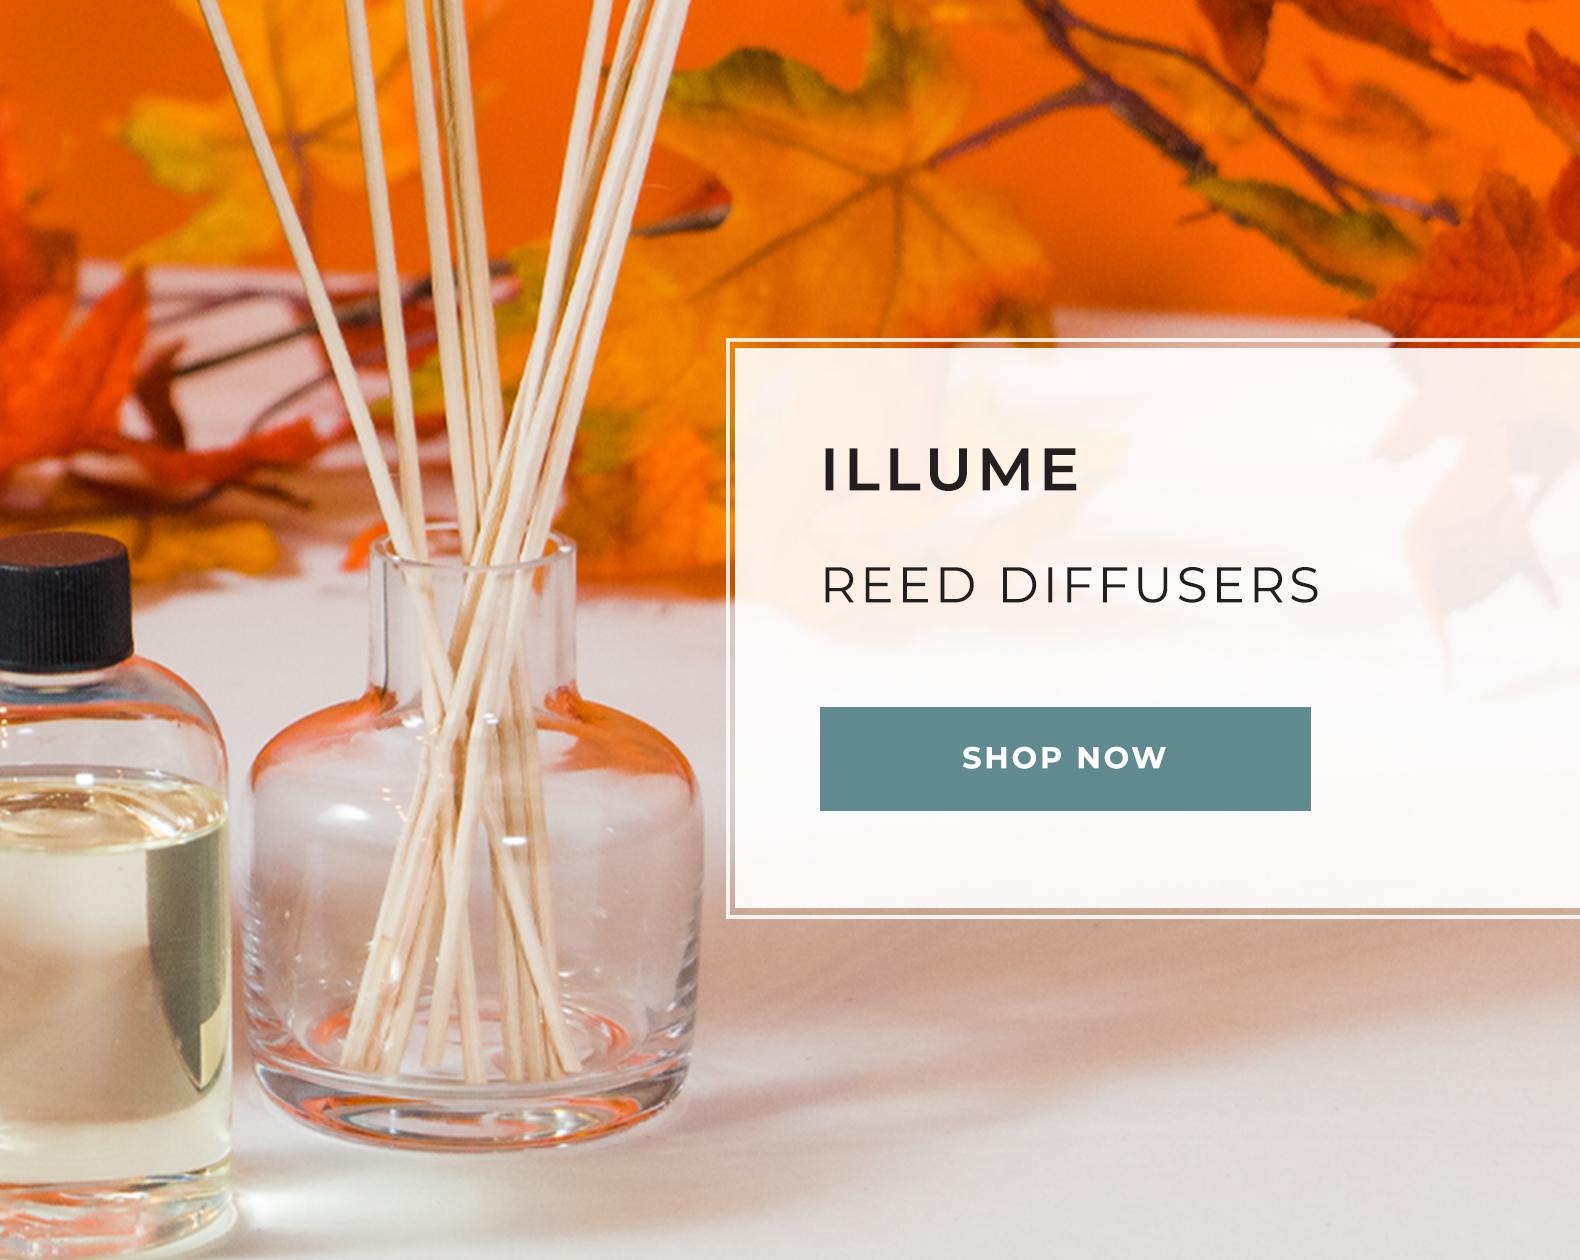 Illume Reed Diffusers